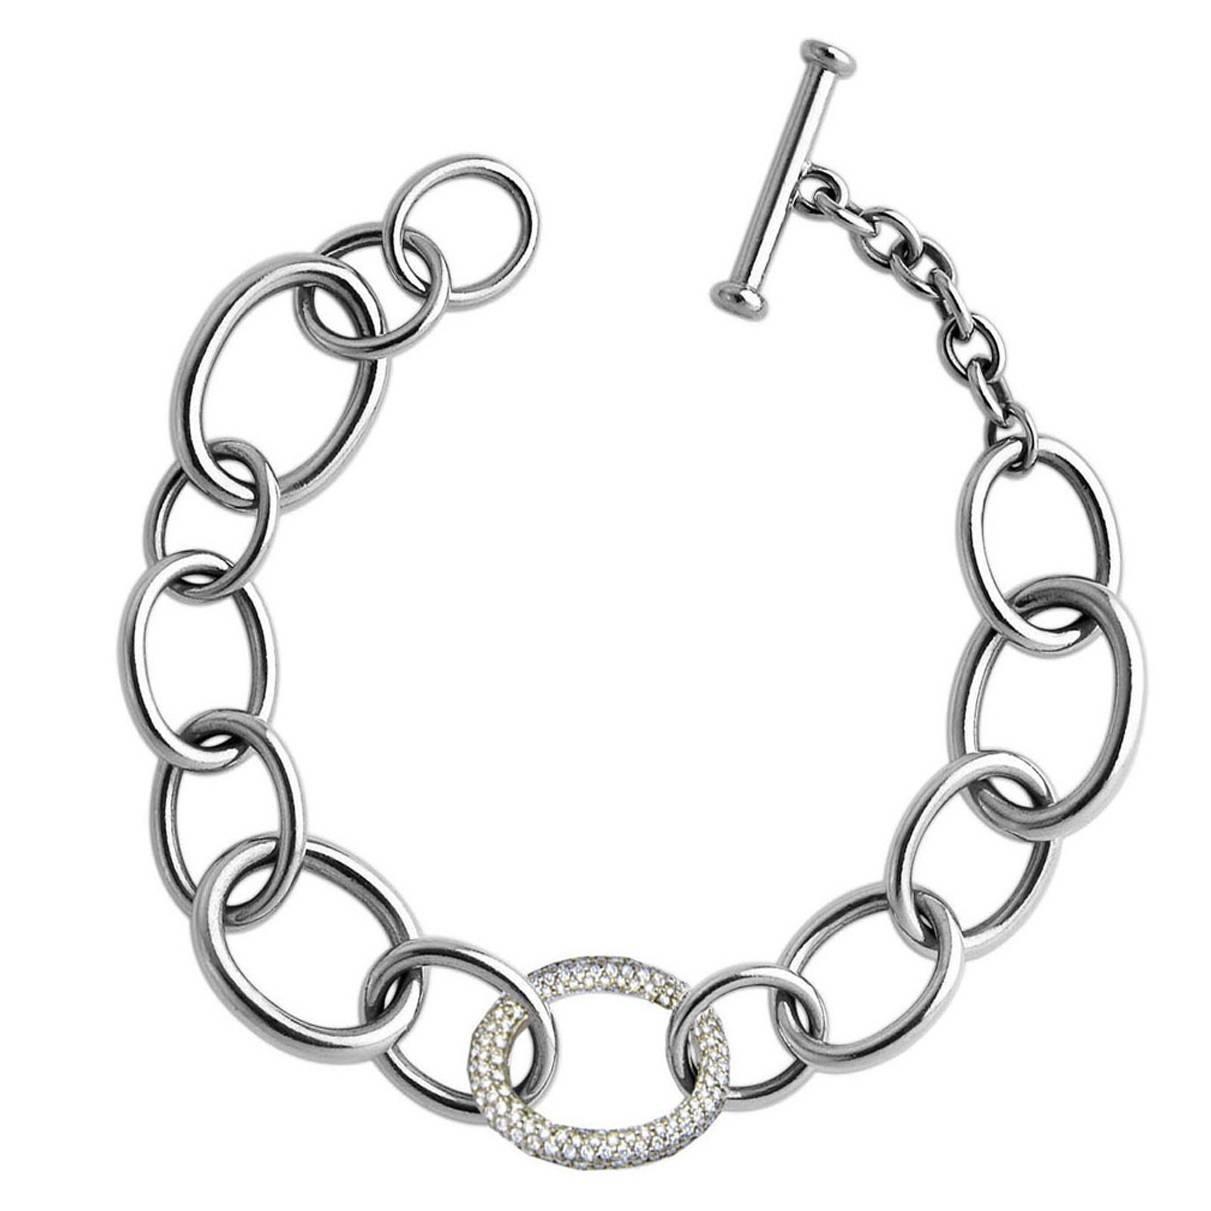 Colleen B. Rosenblat Gold Bracelet With Diamond Loop